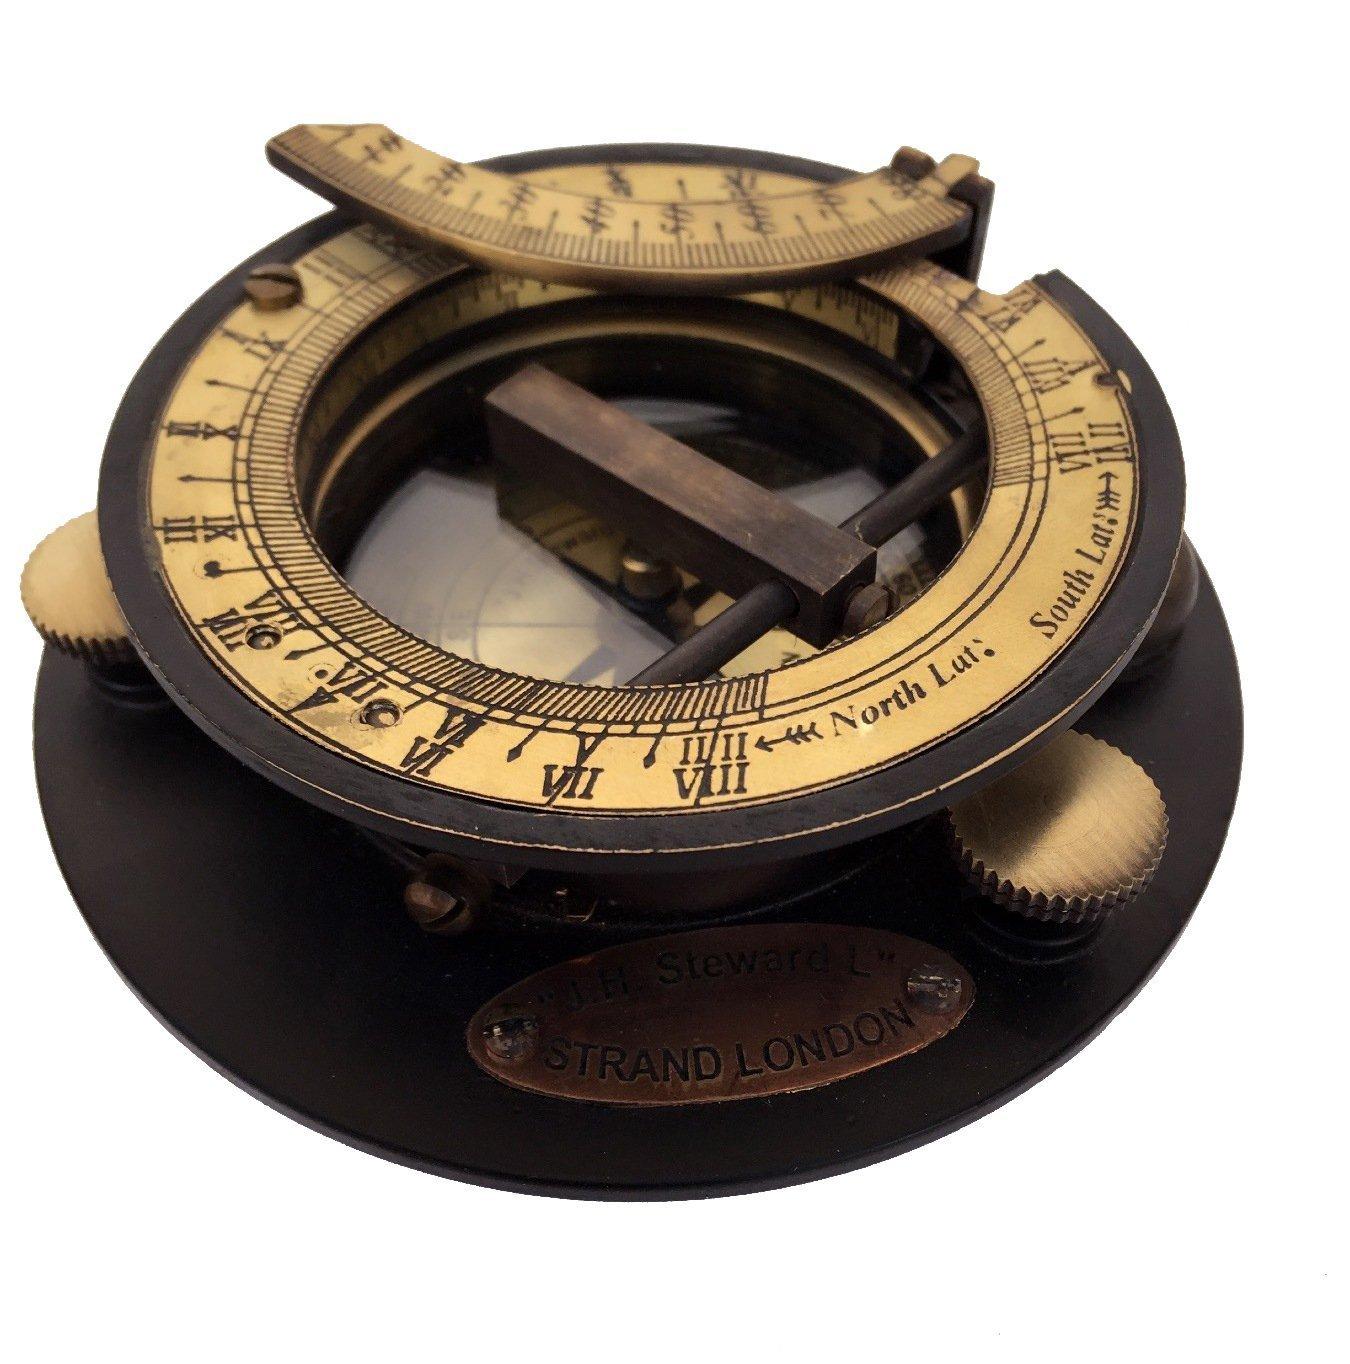 U.S Handicrafts Vintage Portable Gilbert Sundial Compass Adjustable Gnomon Antique Instrument 1115